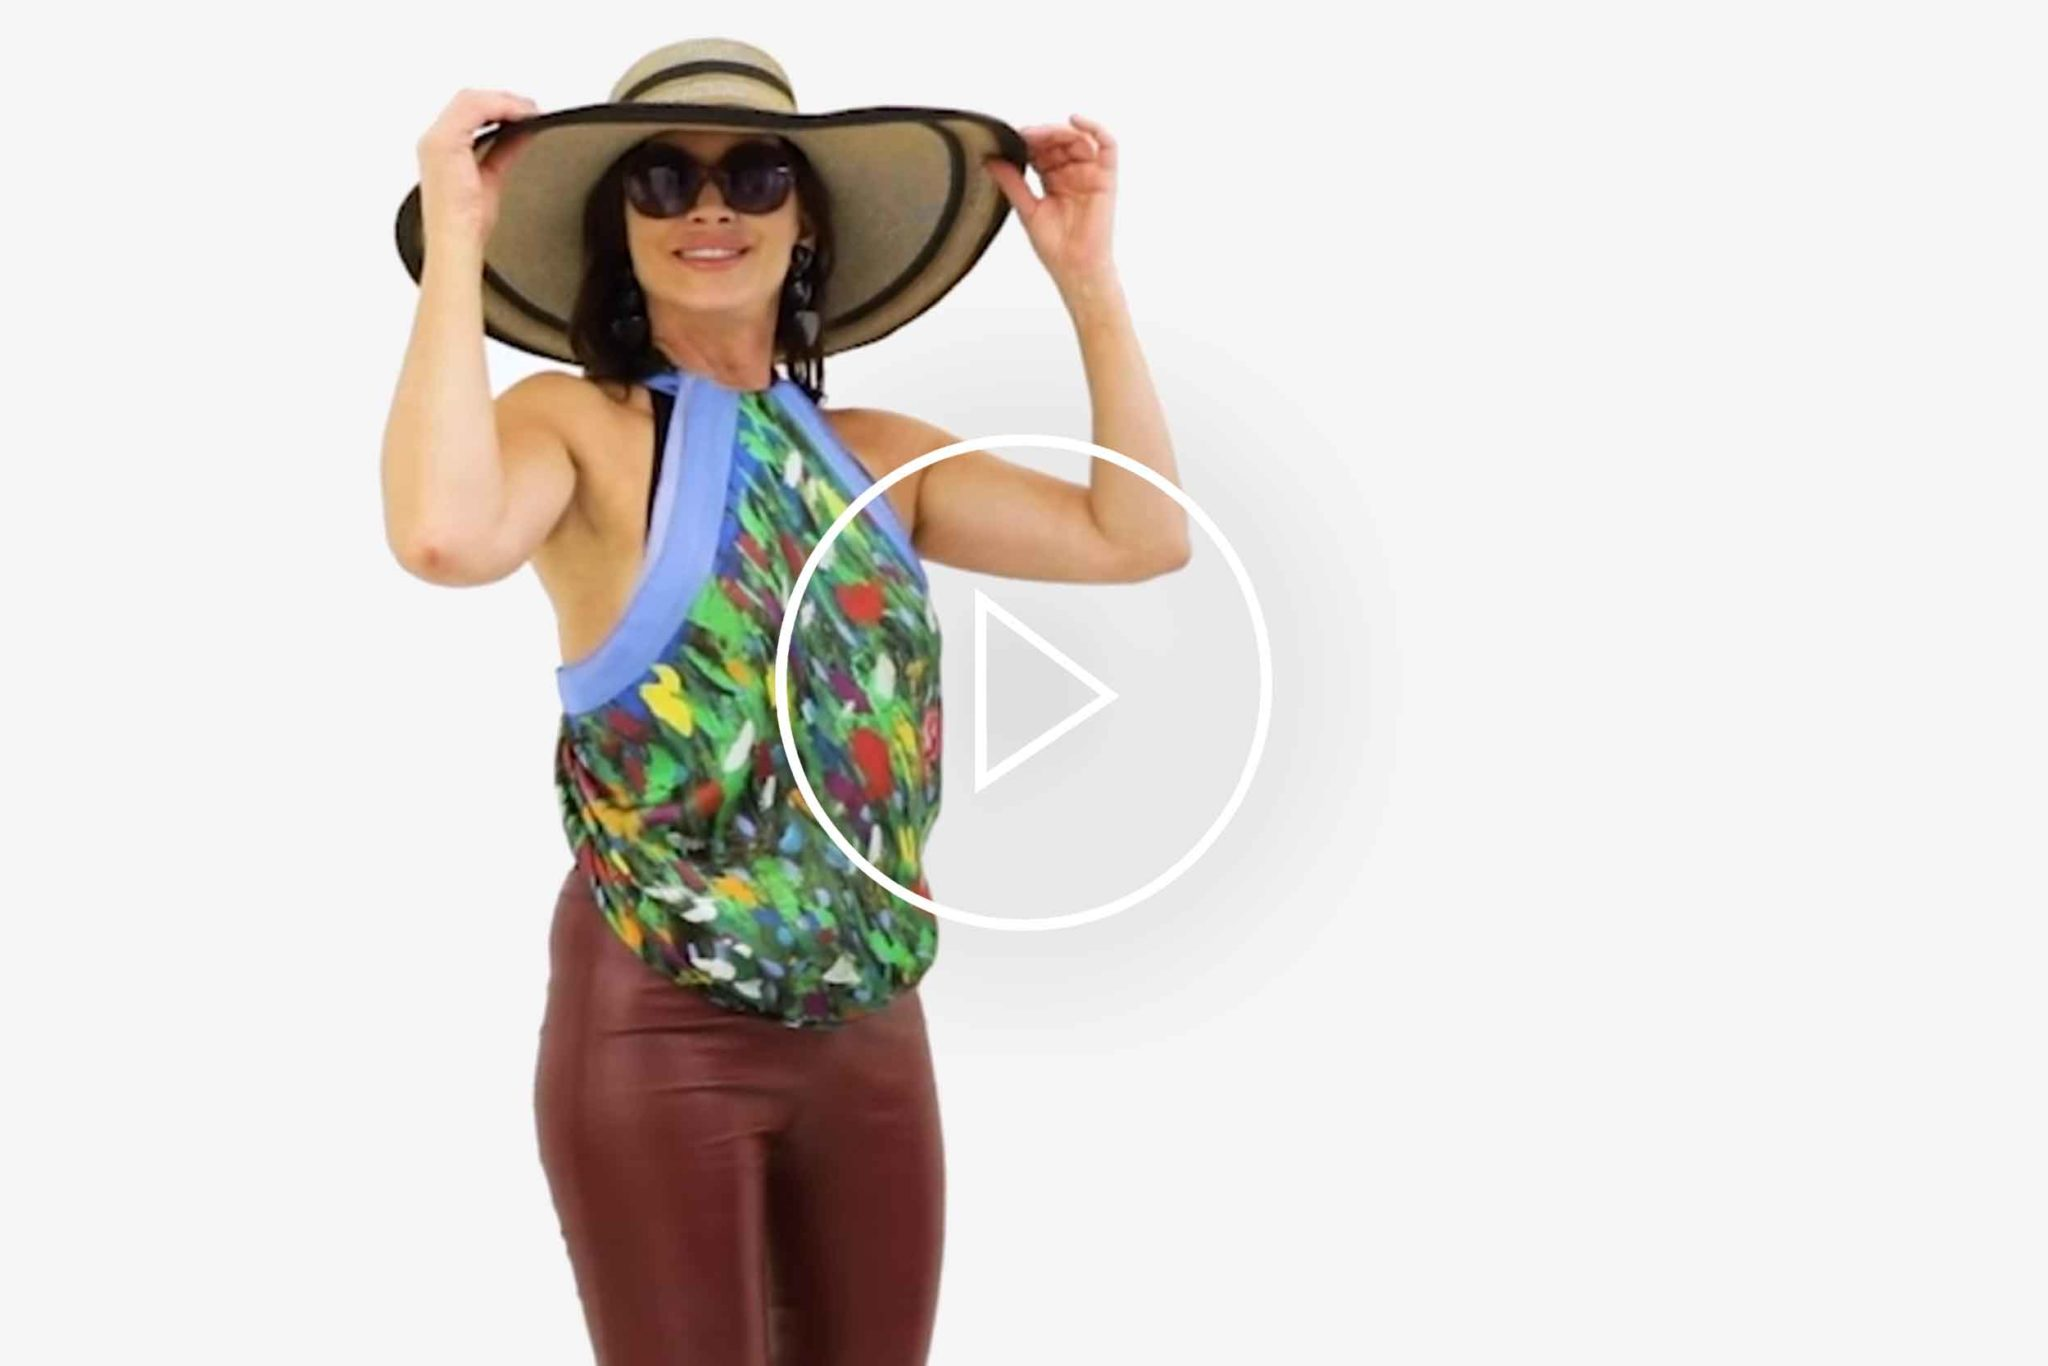 Cornelia Hagmann La Galleria Silk Scarves Styles Inspirations No 7 8 9, Seidenschal, sciarpa di seta, foulard soie,